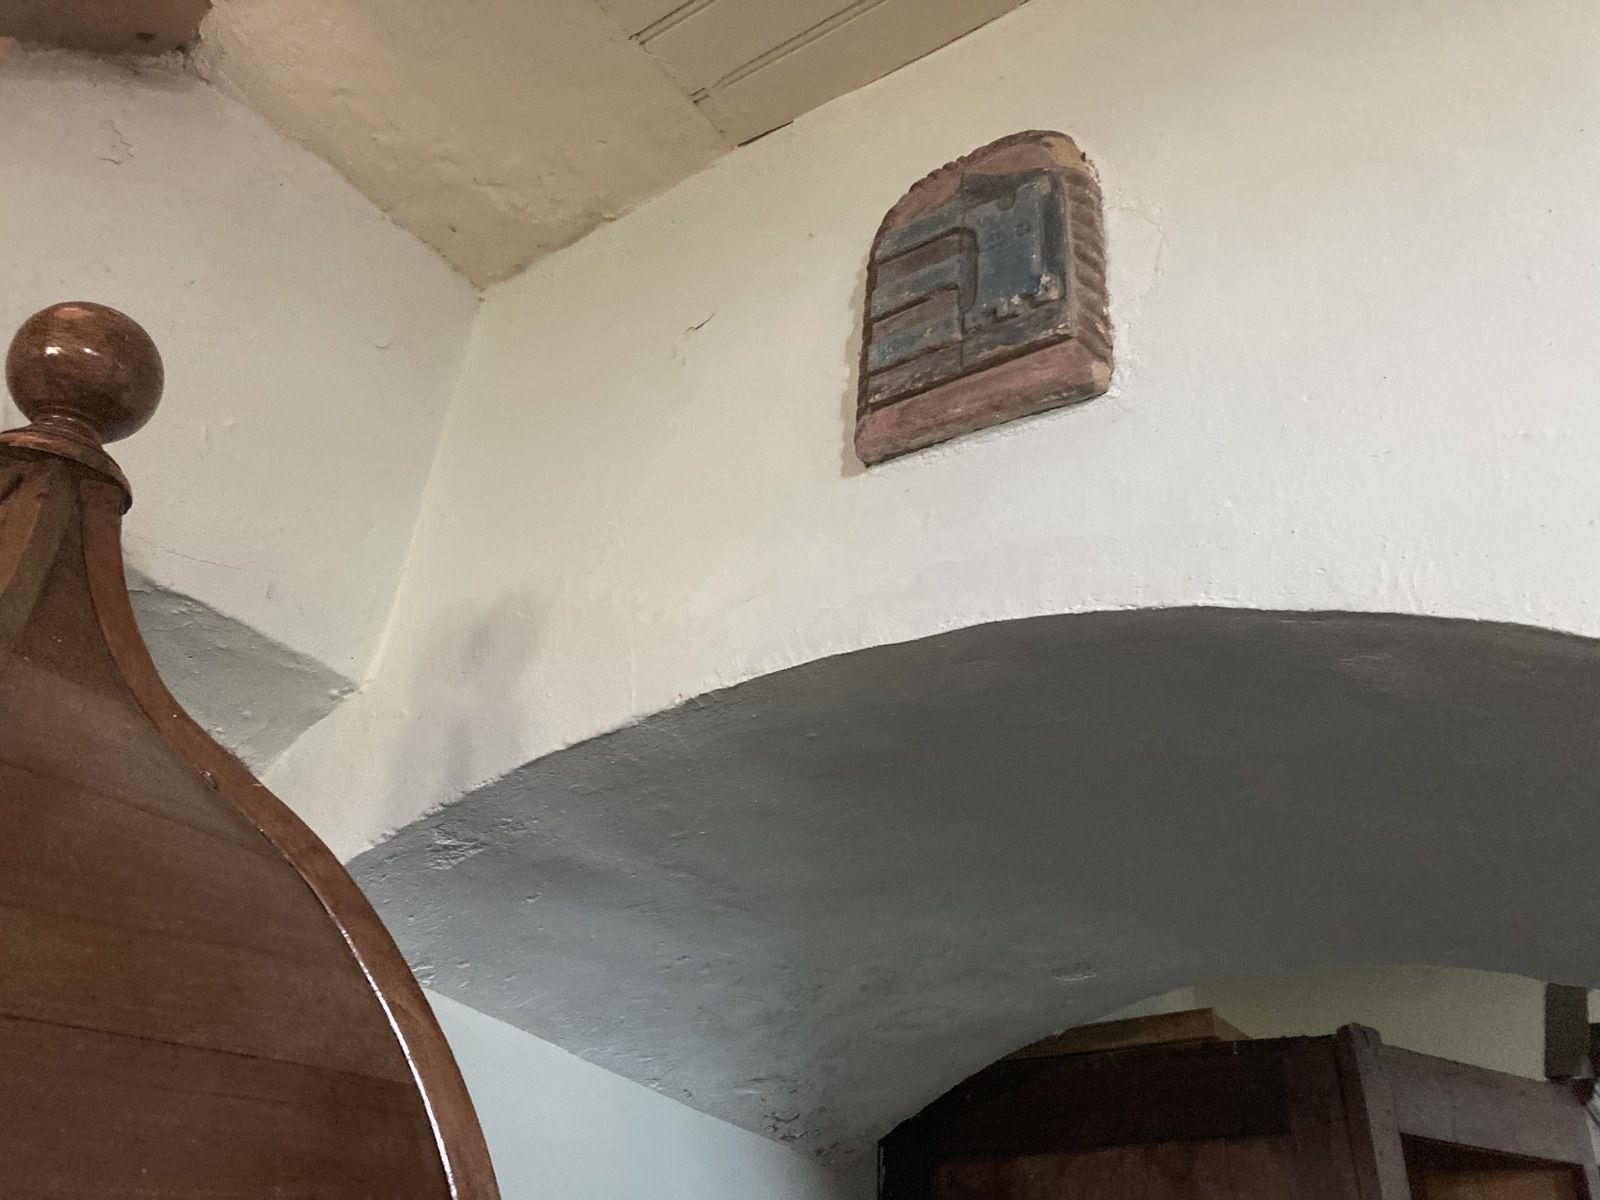 Vestiges du portanel du fort aujourd'hui disparu